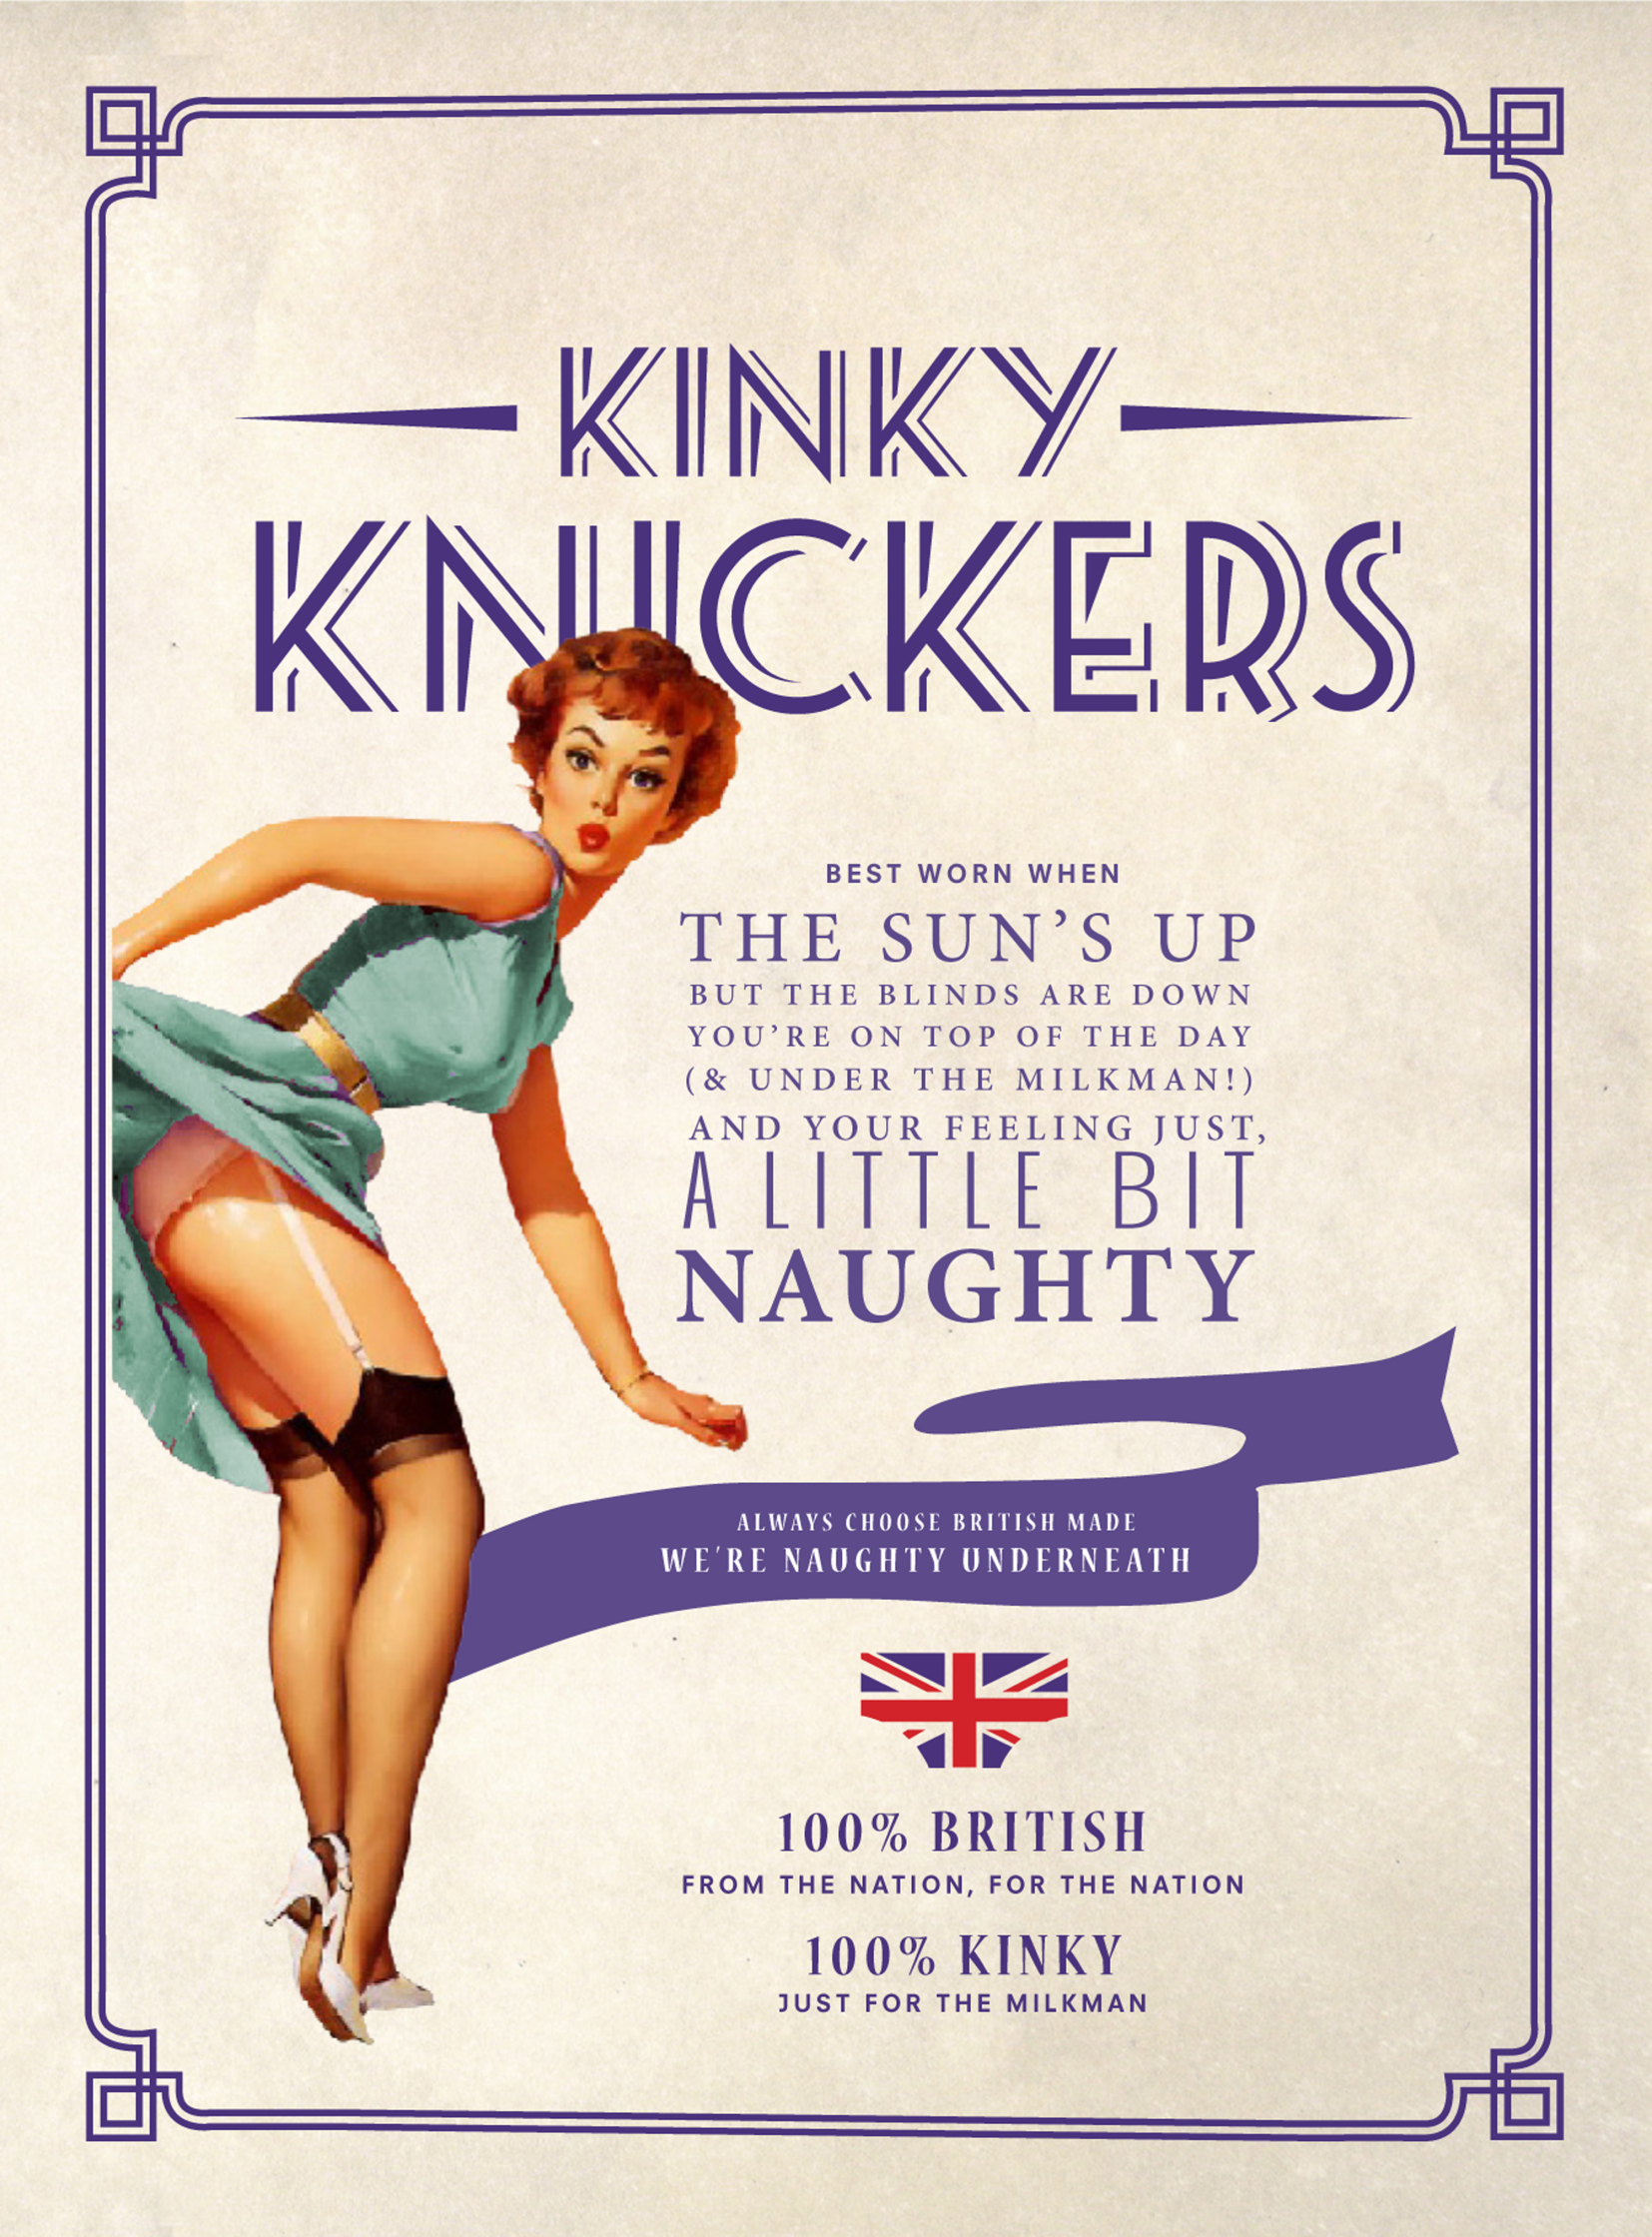 Mary Portas Kinky Knickers